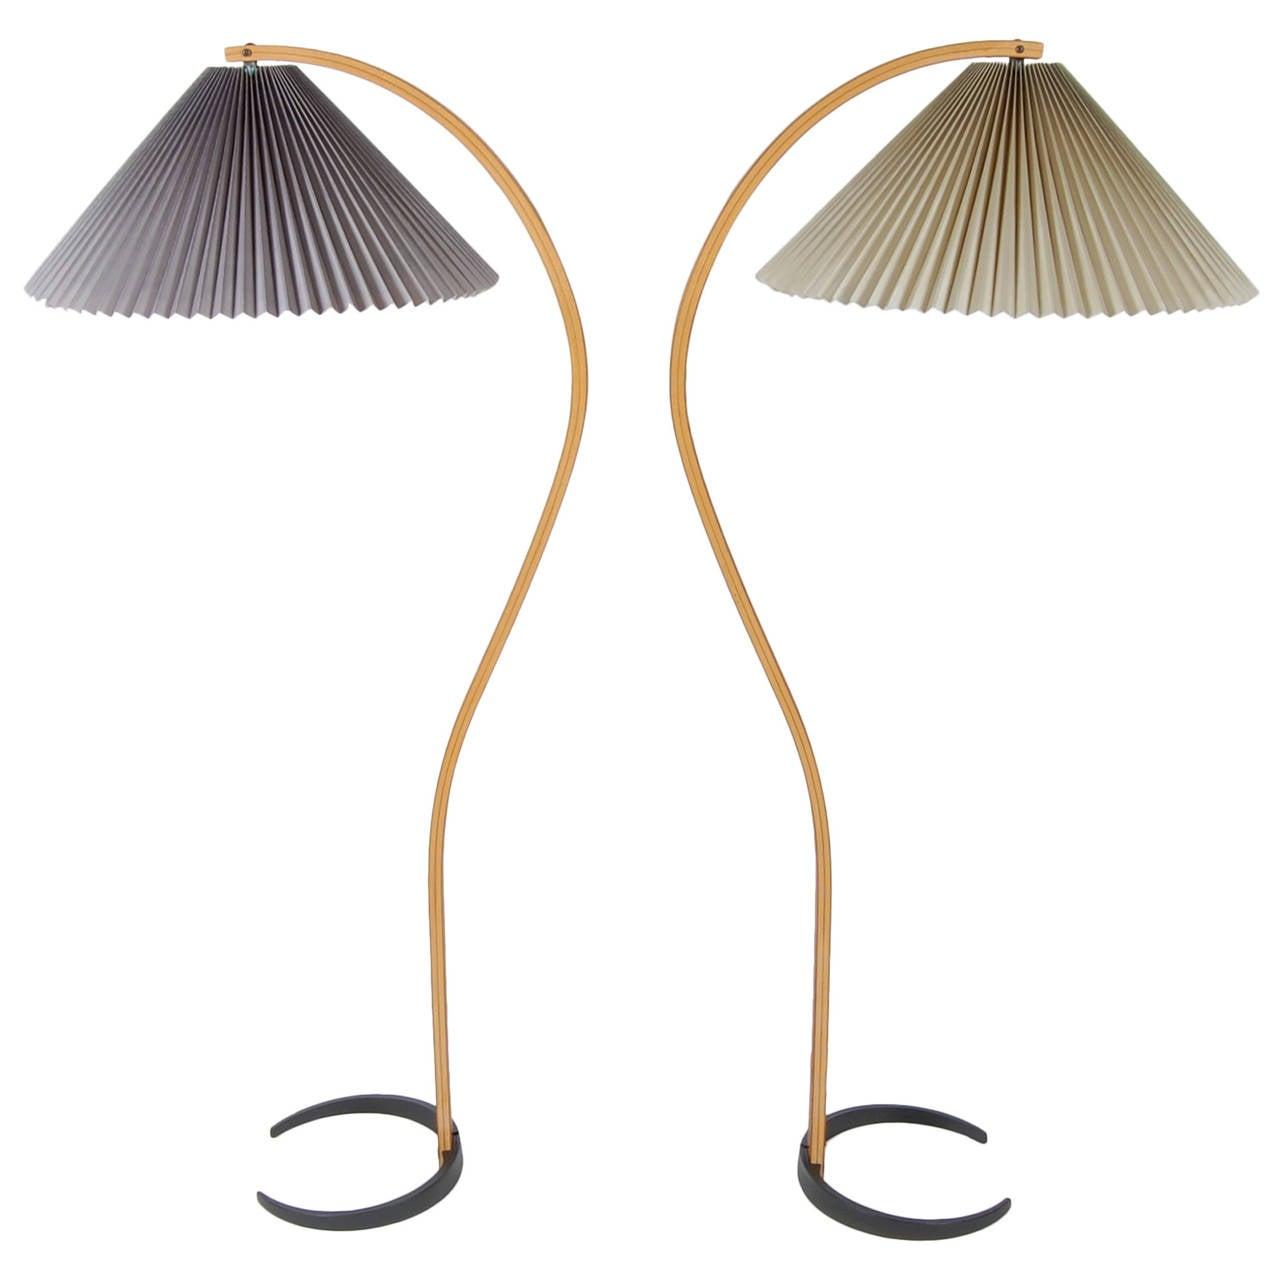 Mads caprani floor lamp danish modern circa 1970s at 1stdibs for 1970s floor lamps